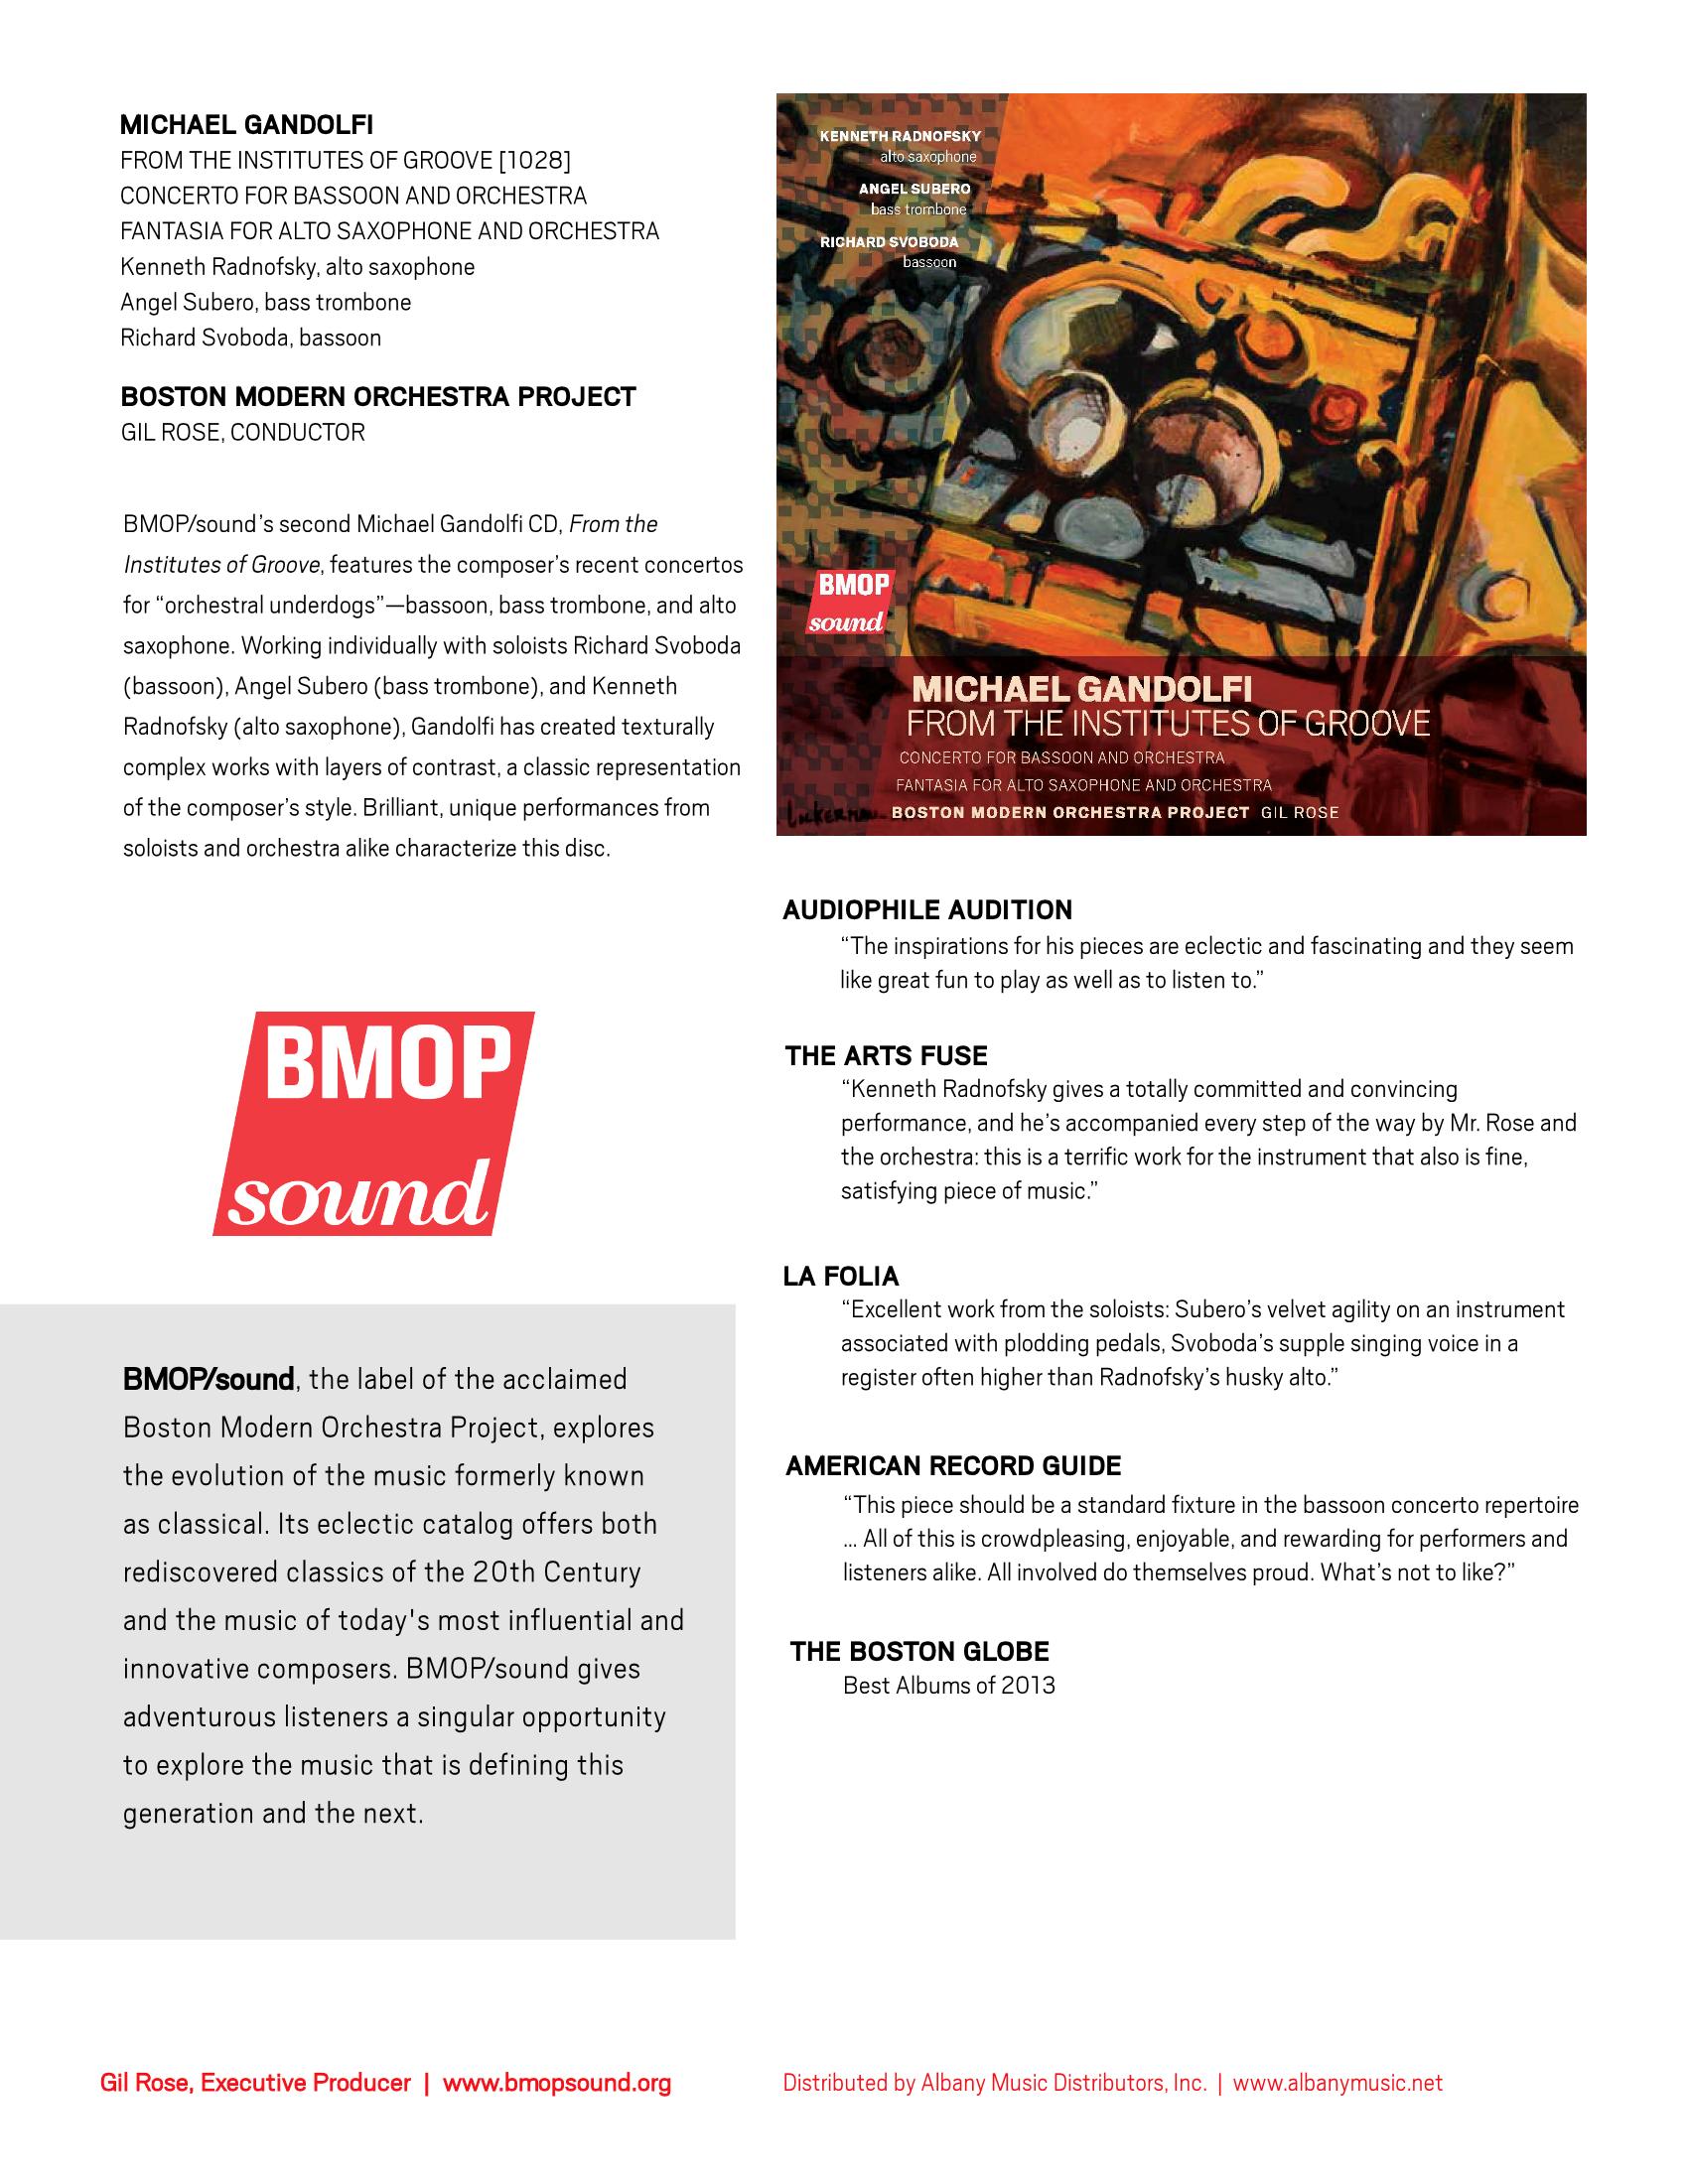 Gandolfi - BMOPsound 1028 one-sheet.png